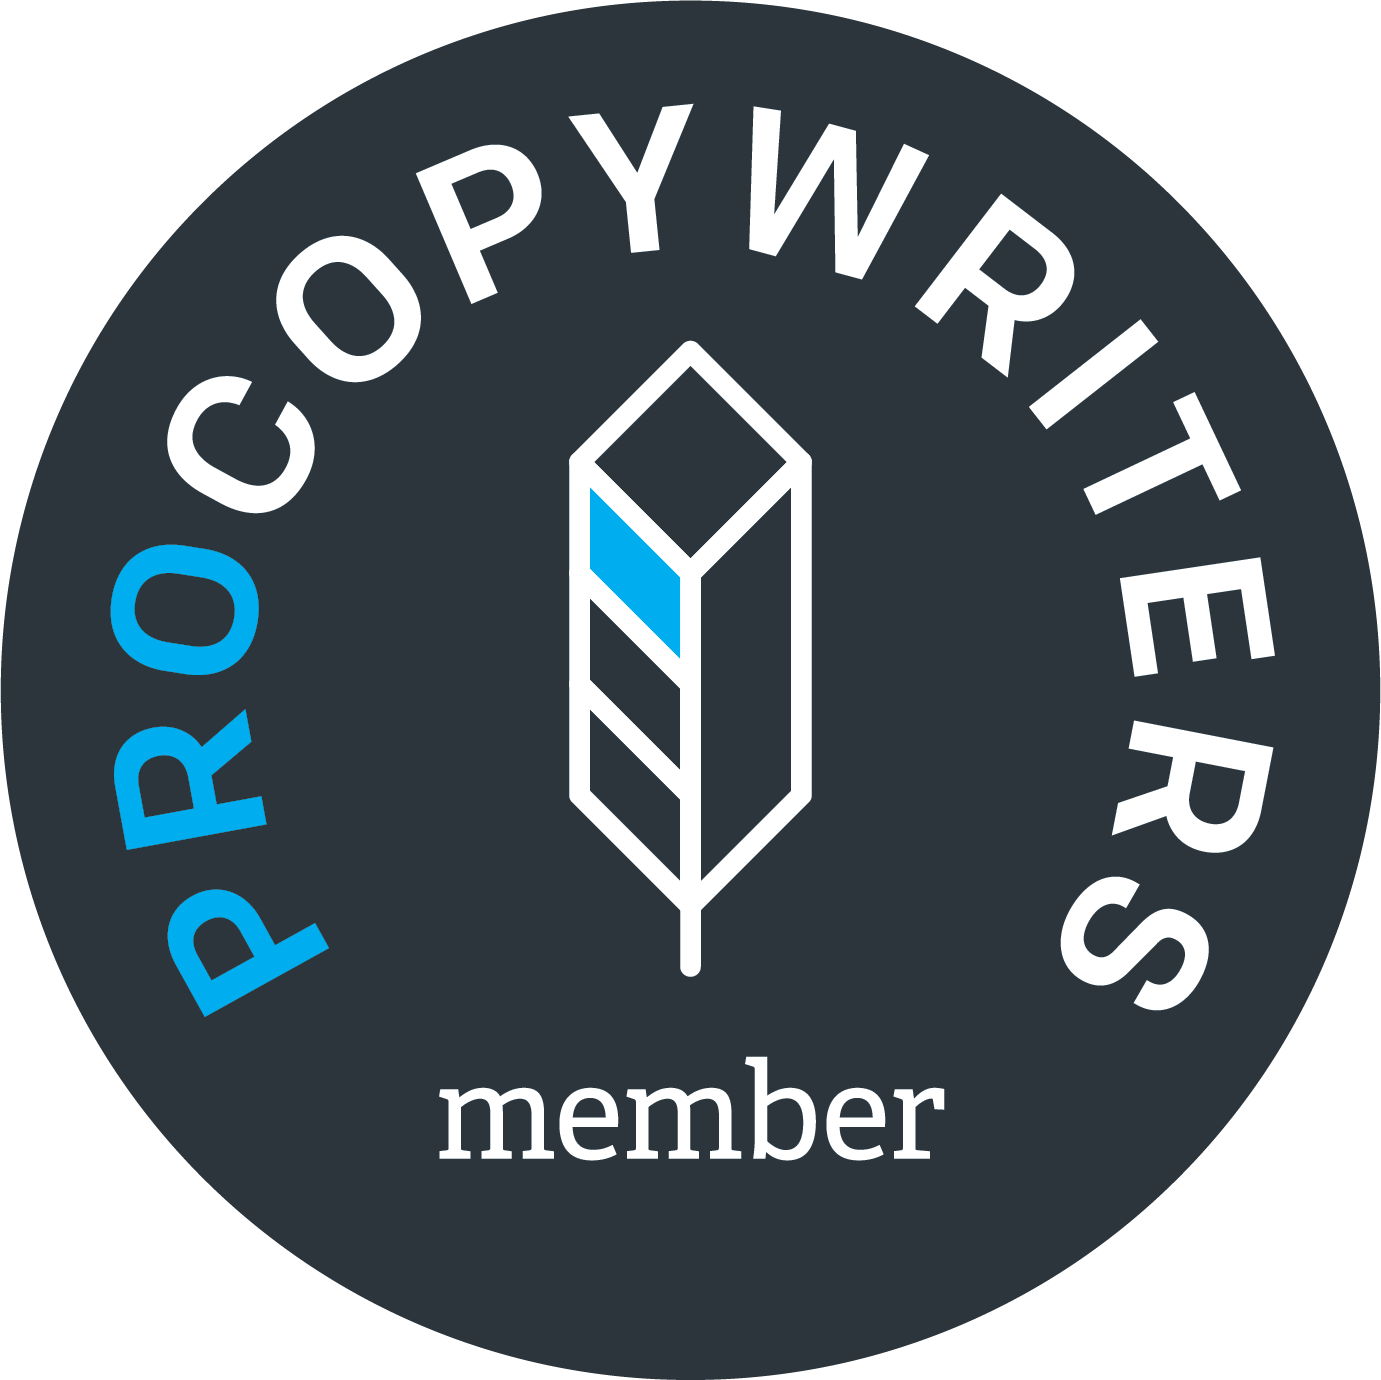 Alex Wright – Freelance Journalist & Copywriter based in